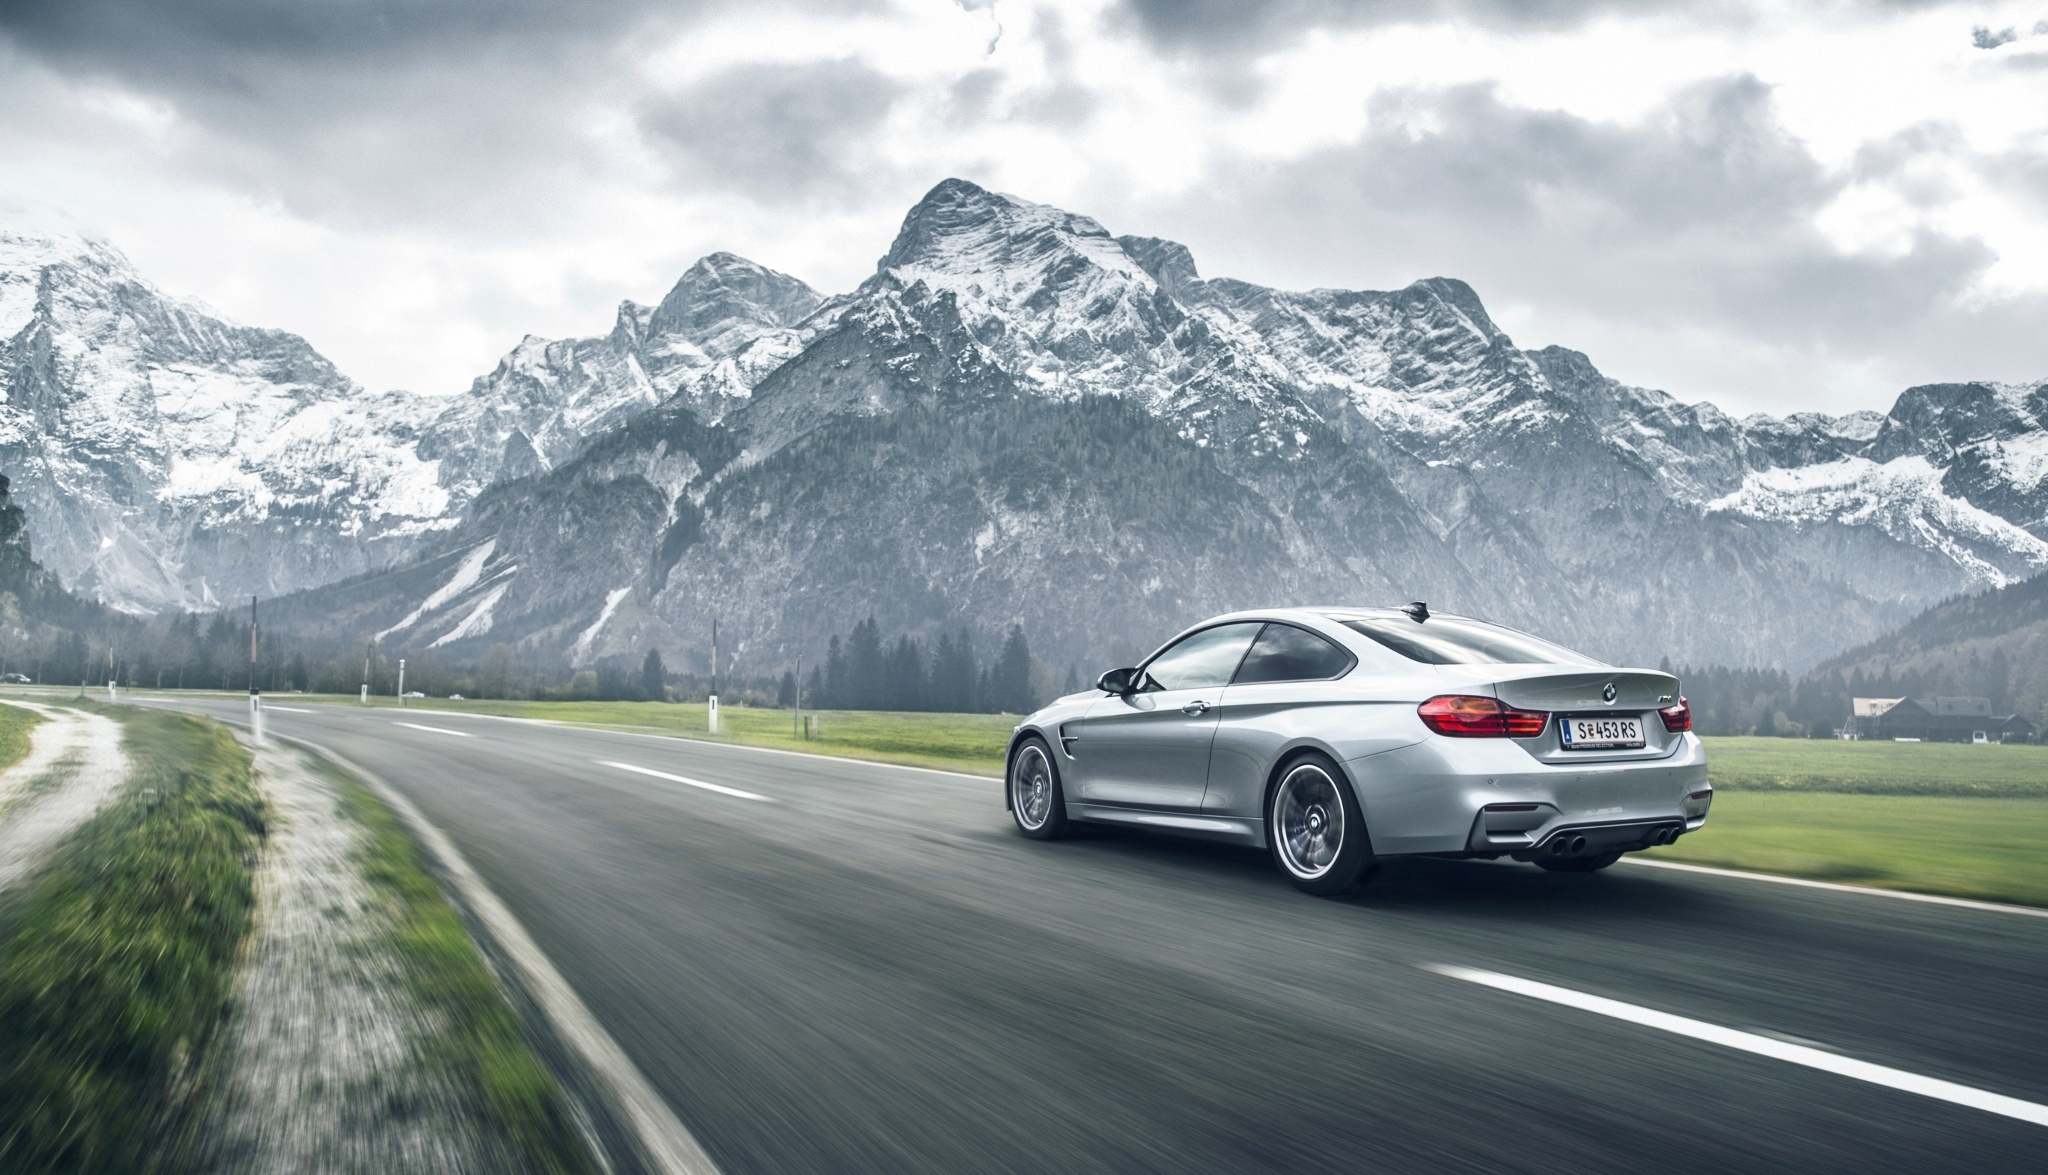 bmw-m4-german-car-speed.jpg